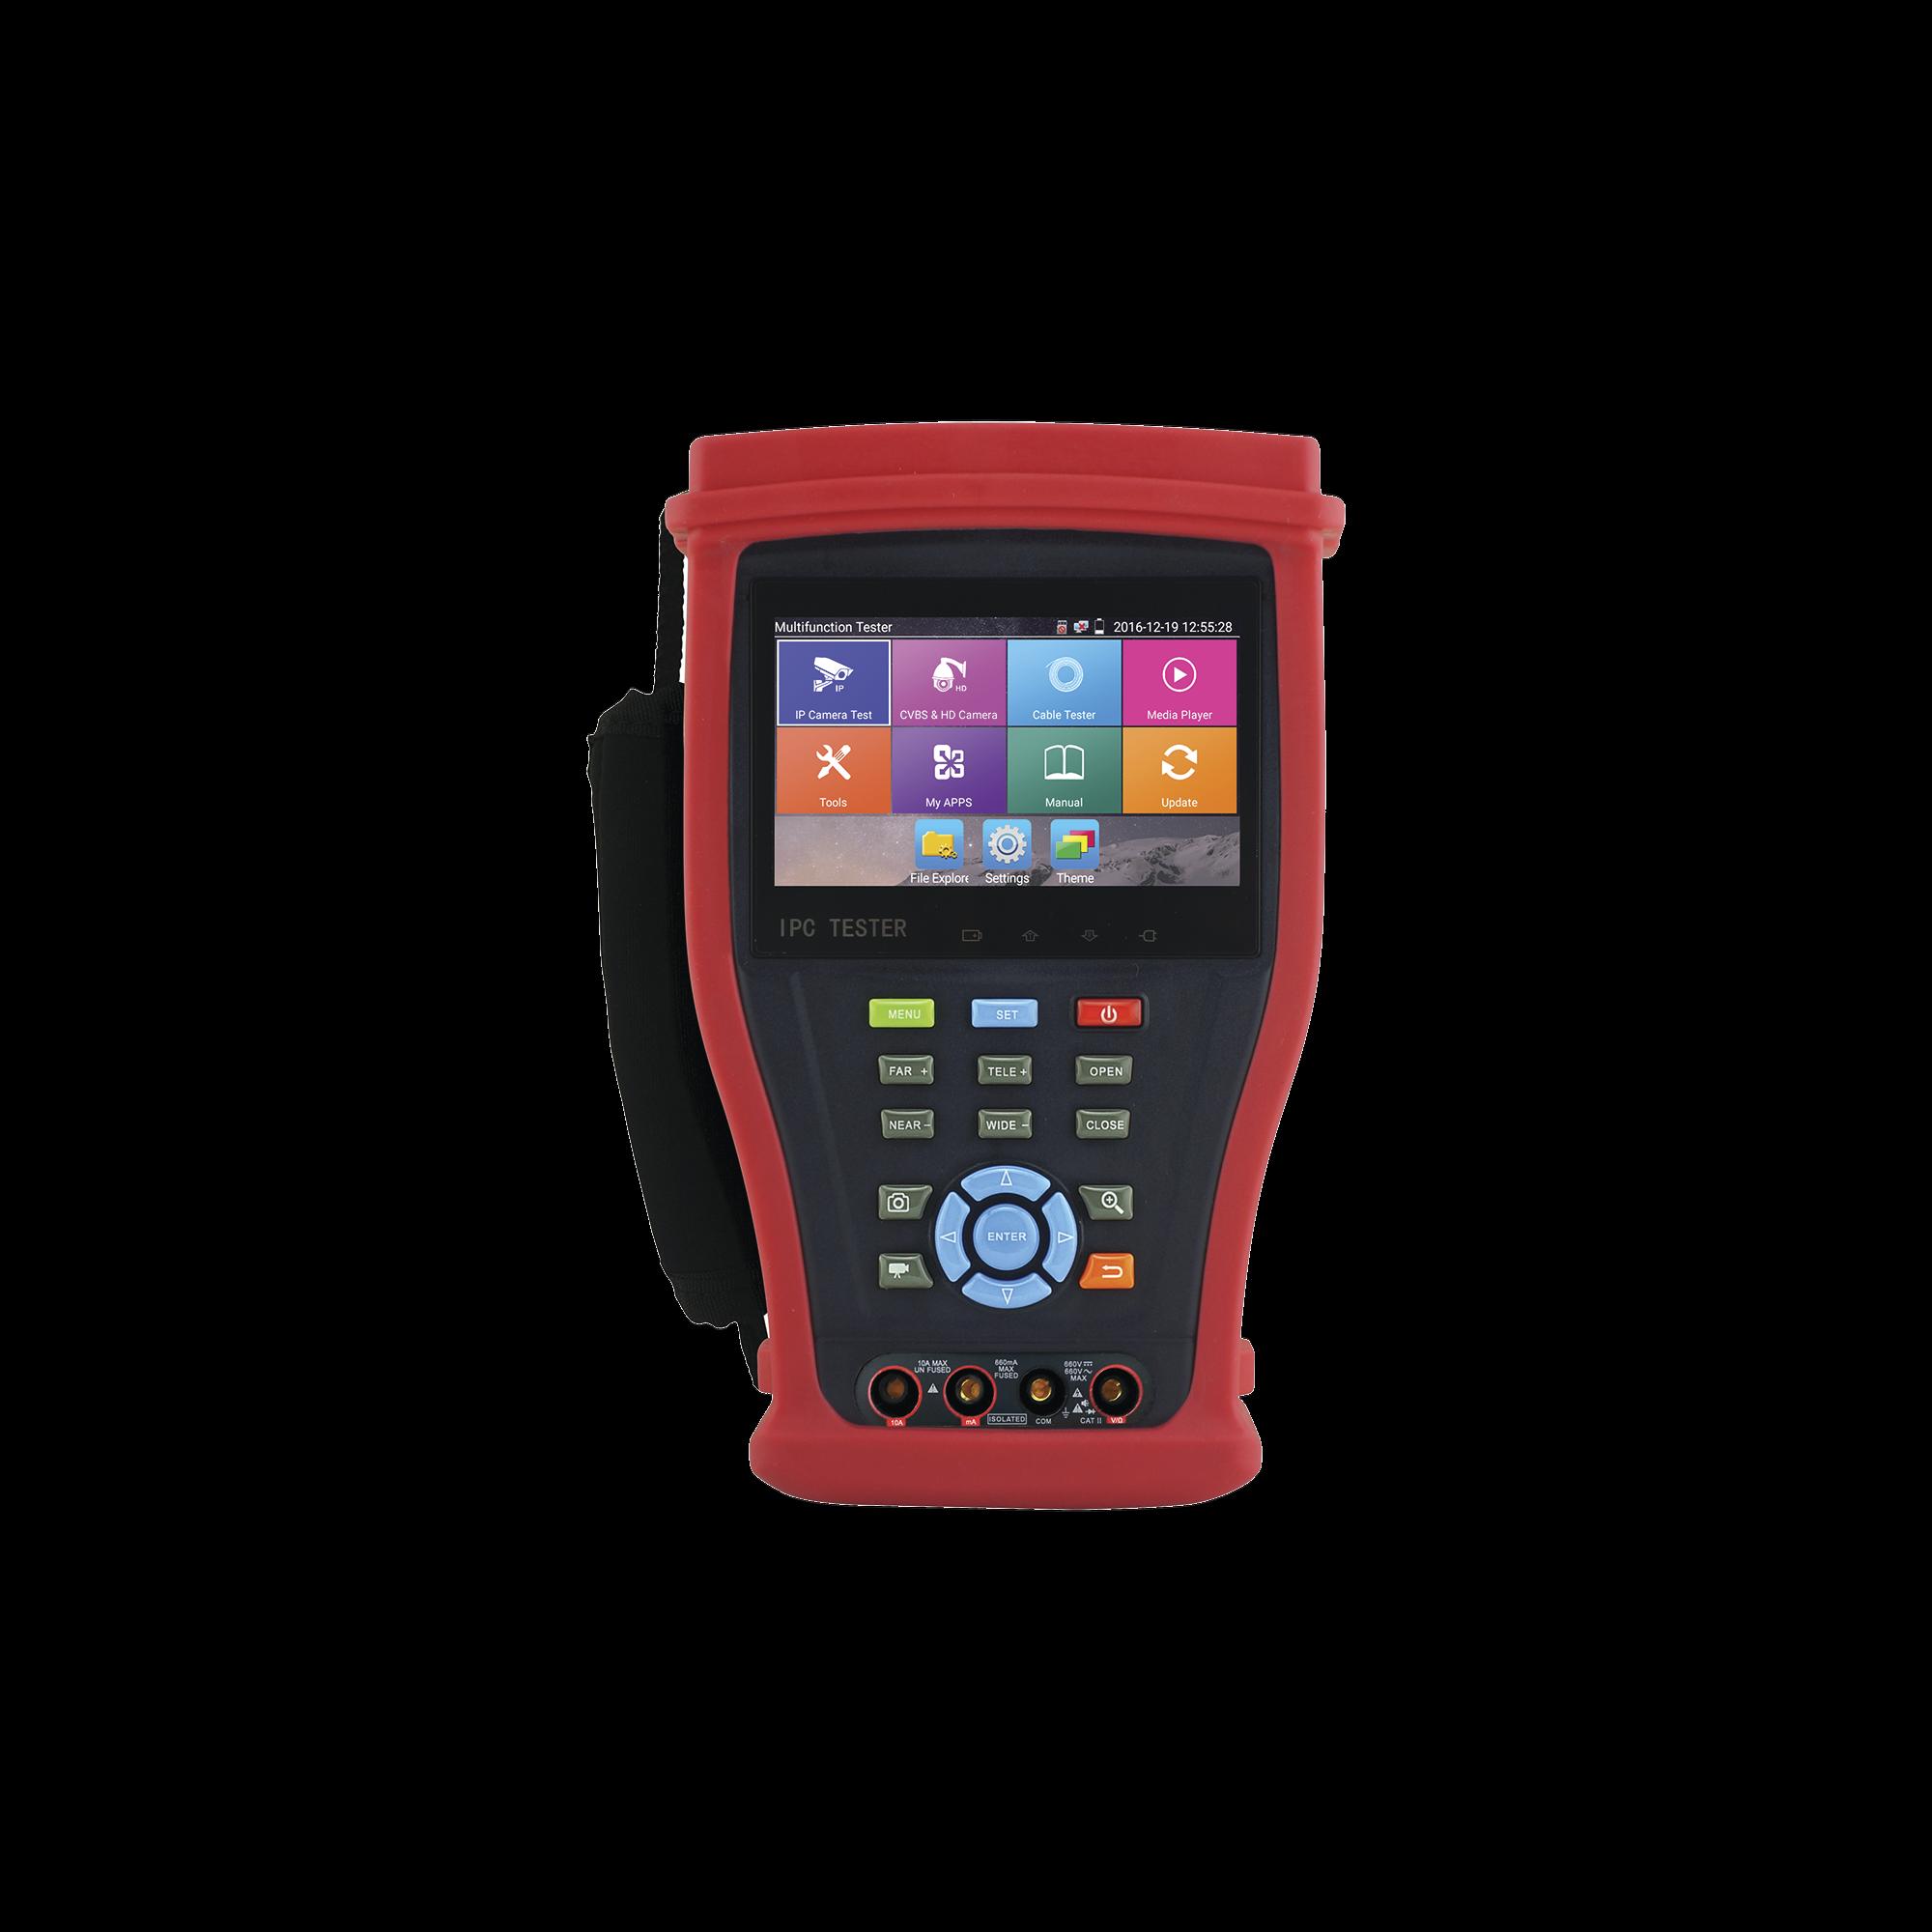 Probador de Video Android con Pantalla LCD de 4.3 para IP 4K / HD-TVI (8MP), HD-CVI (8MP), AHD (5MP) / Multímetro Digital, HDMI Entrada/ Salida, WiFi